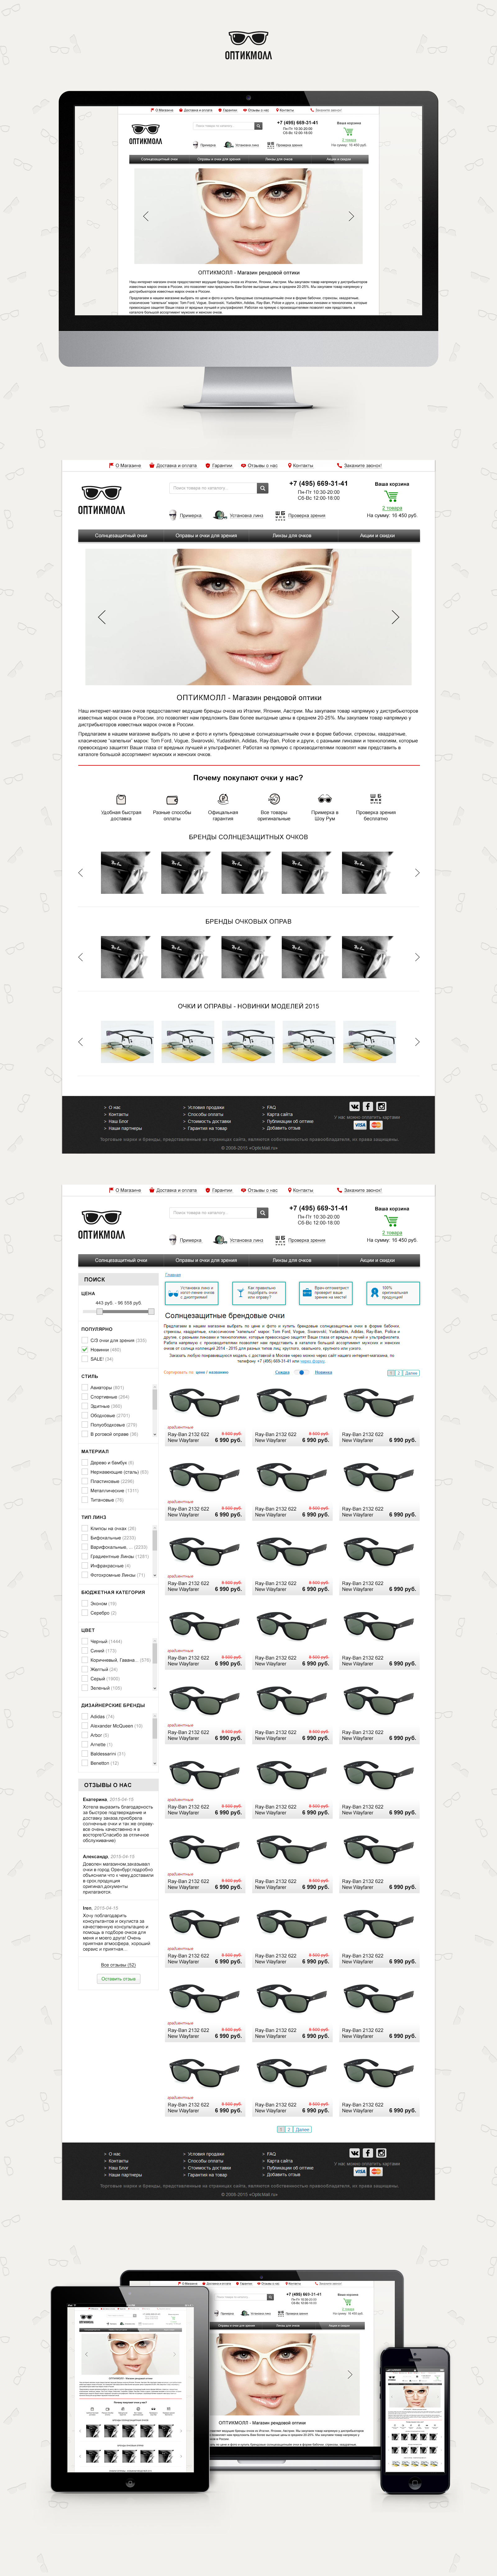 Адаптативный дизайн для сайта www.opticmall.ru